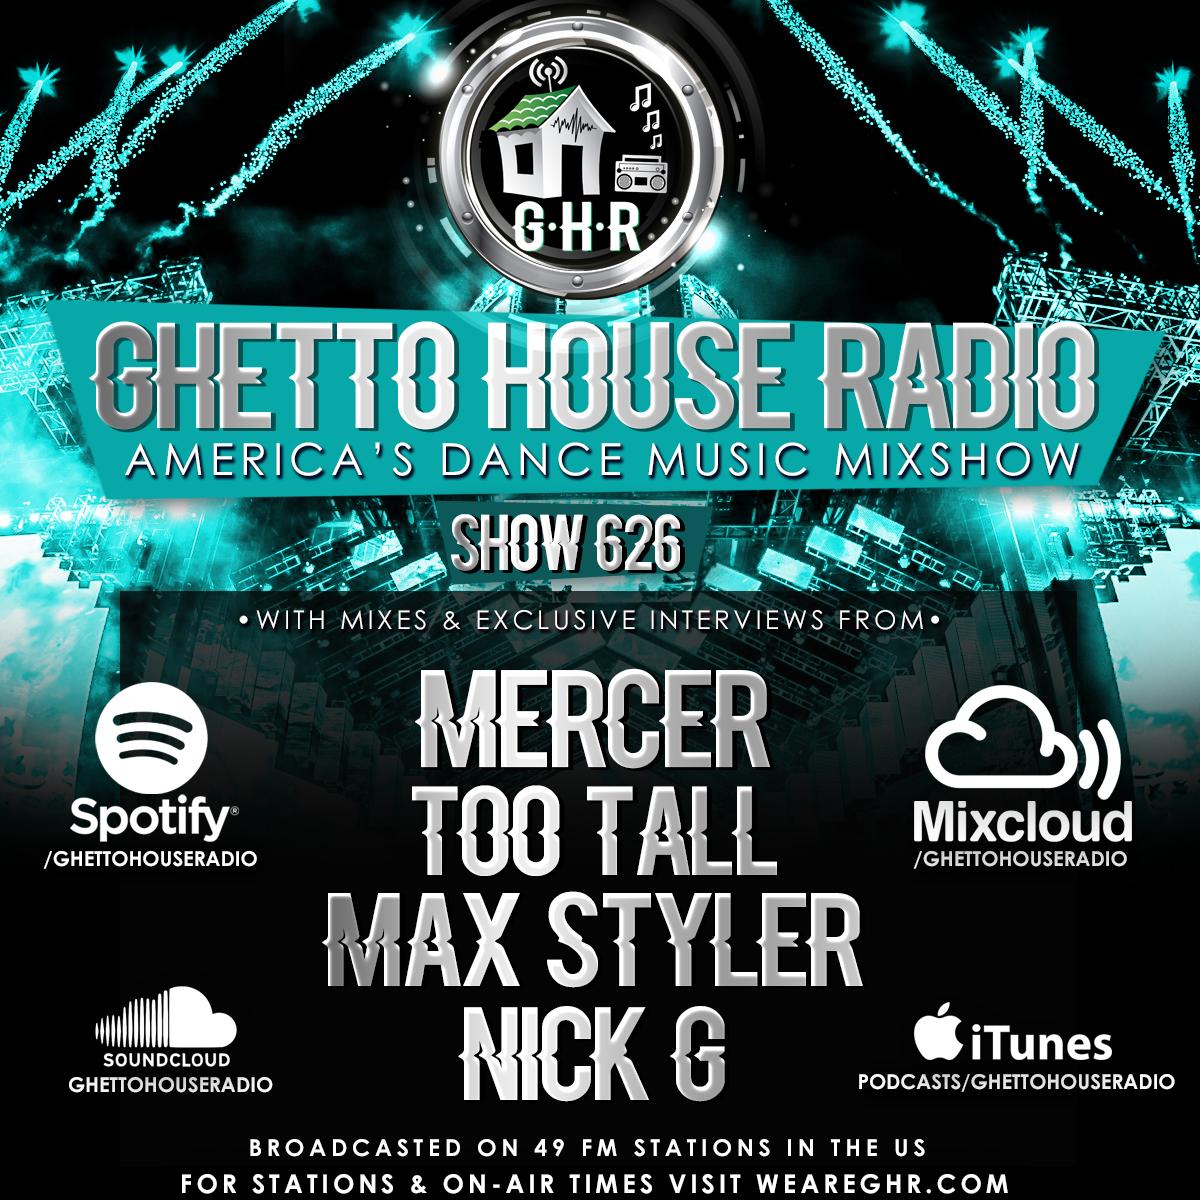 GHR - Show 626 - Mercer + Max Styler!